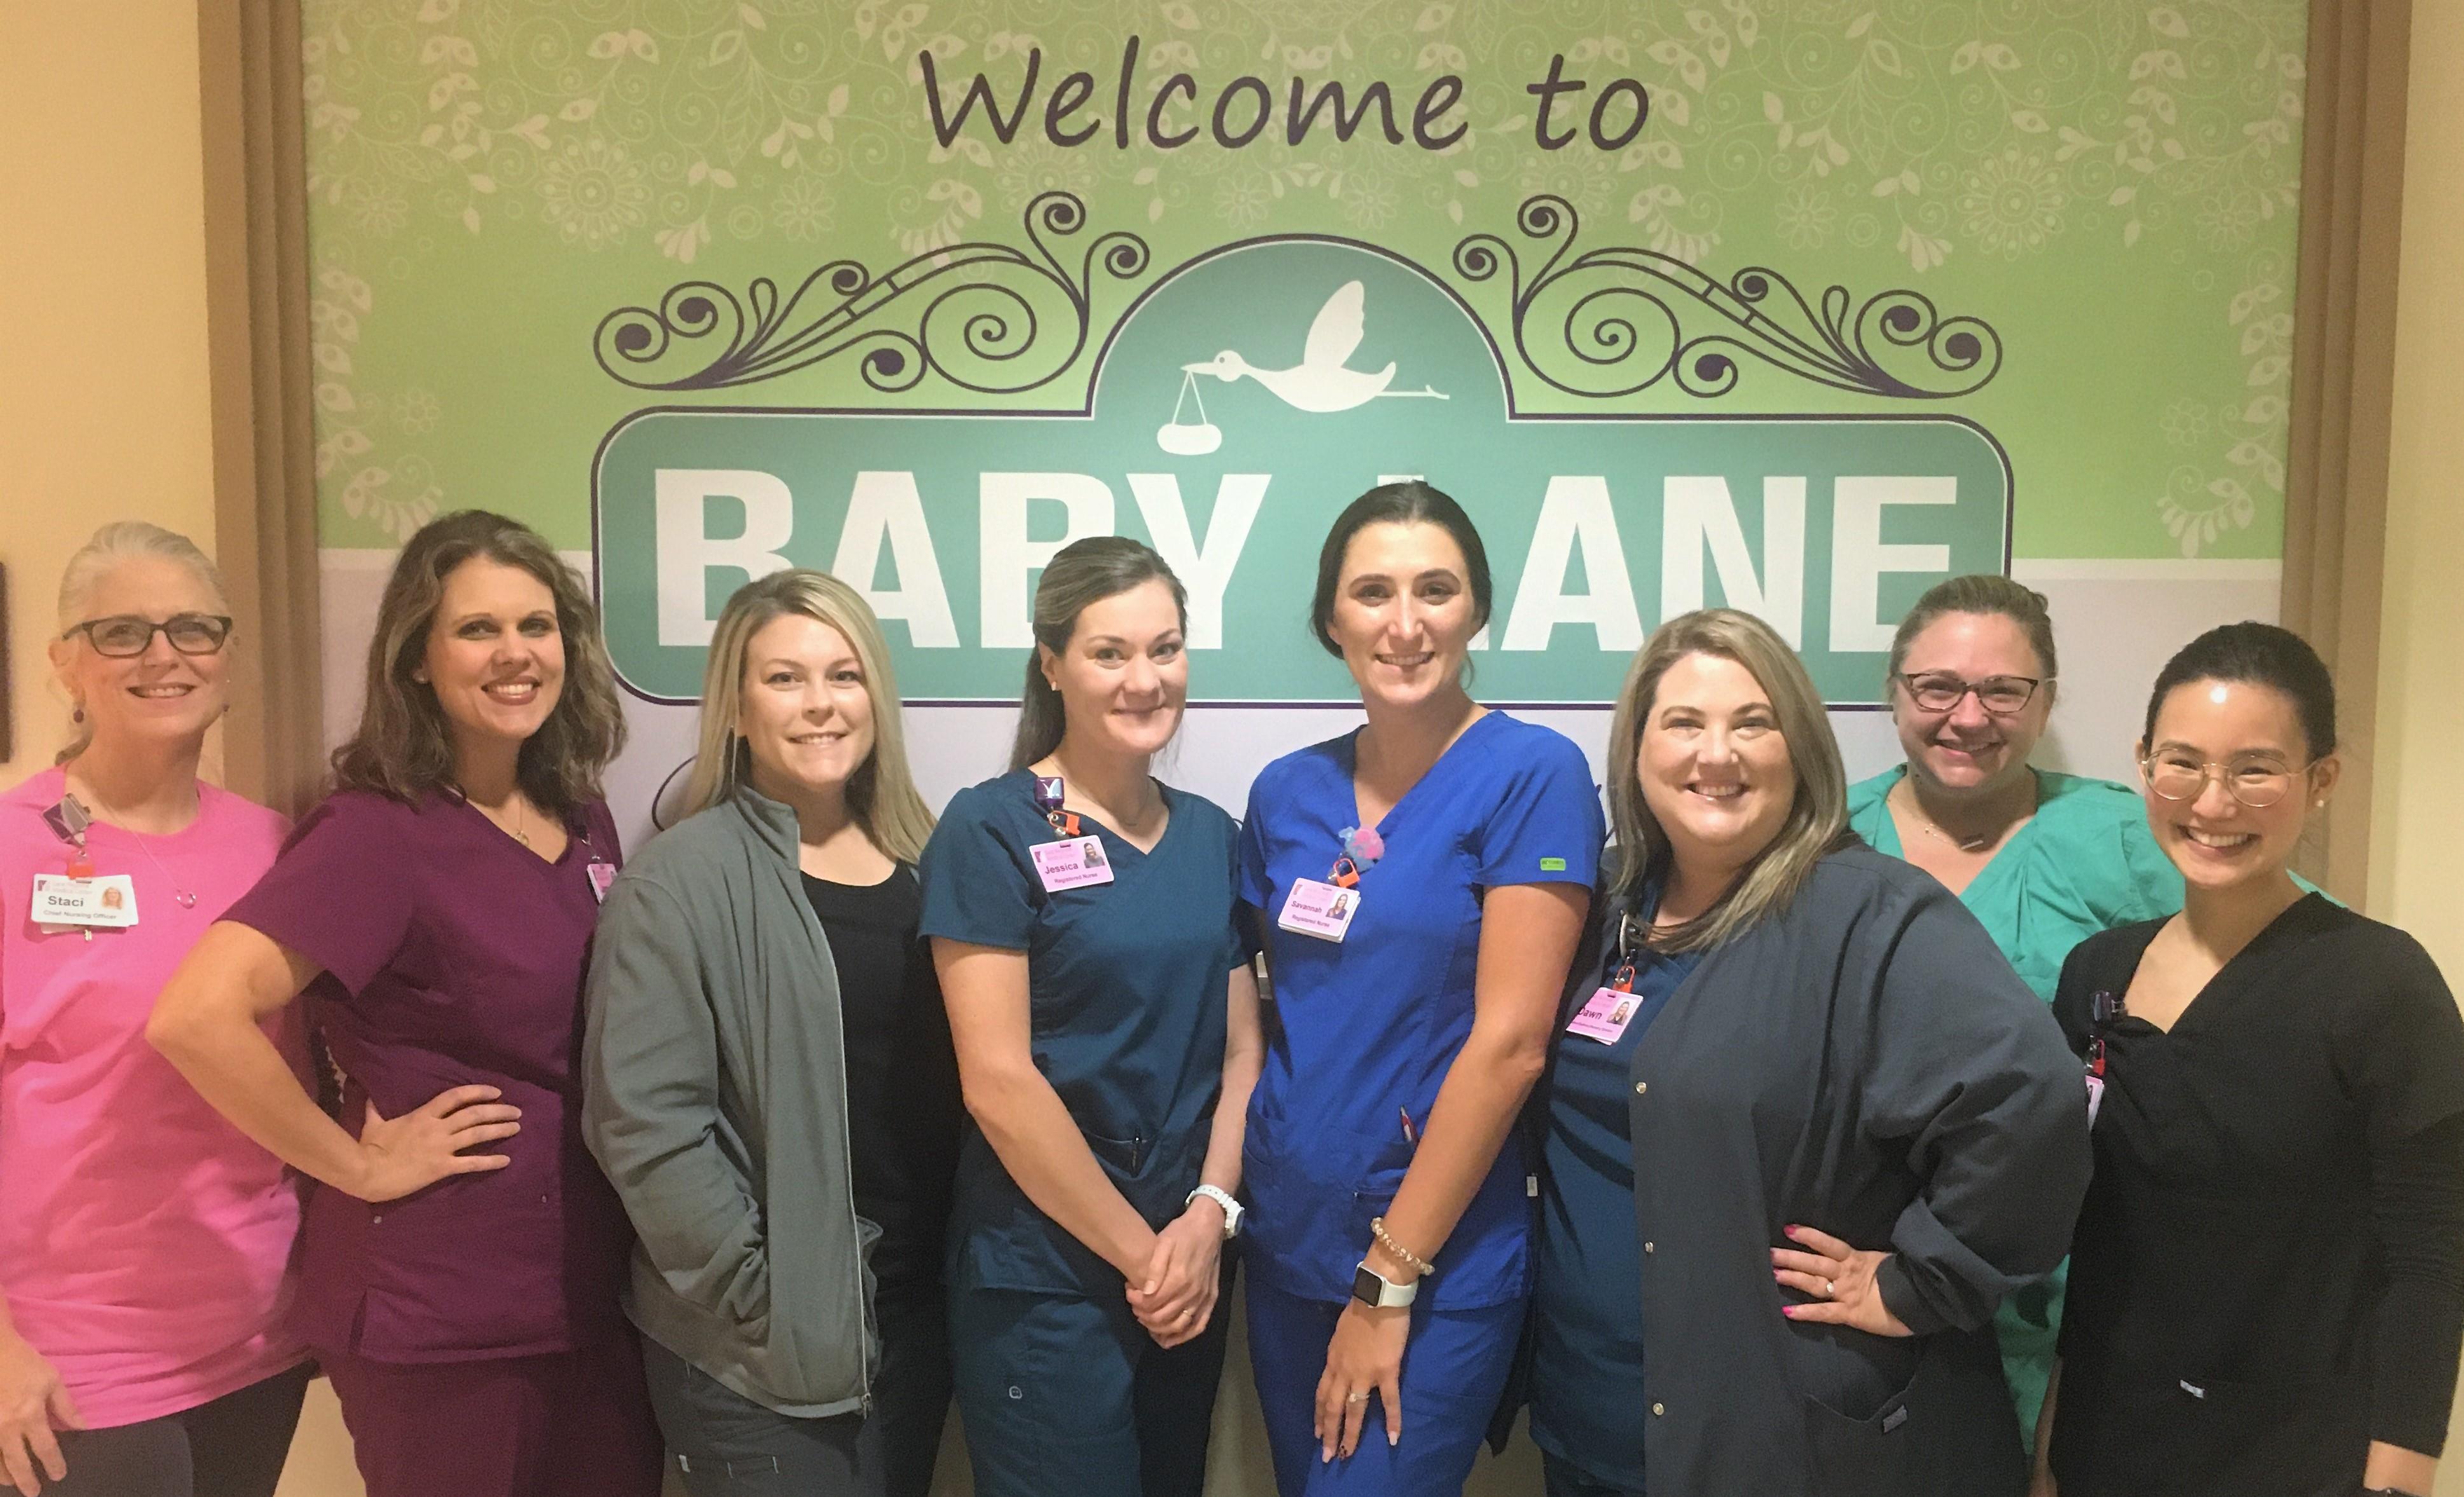 Lane Regional Medical Center Receives Birth Ready Designation